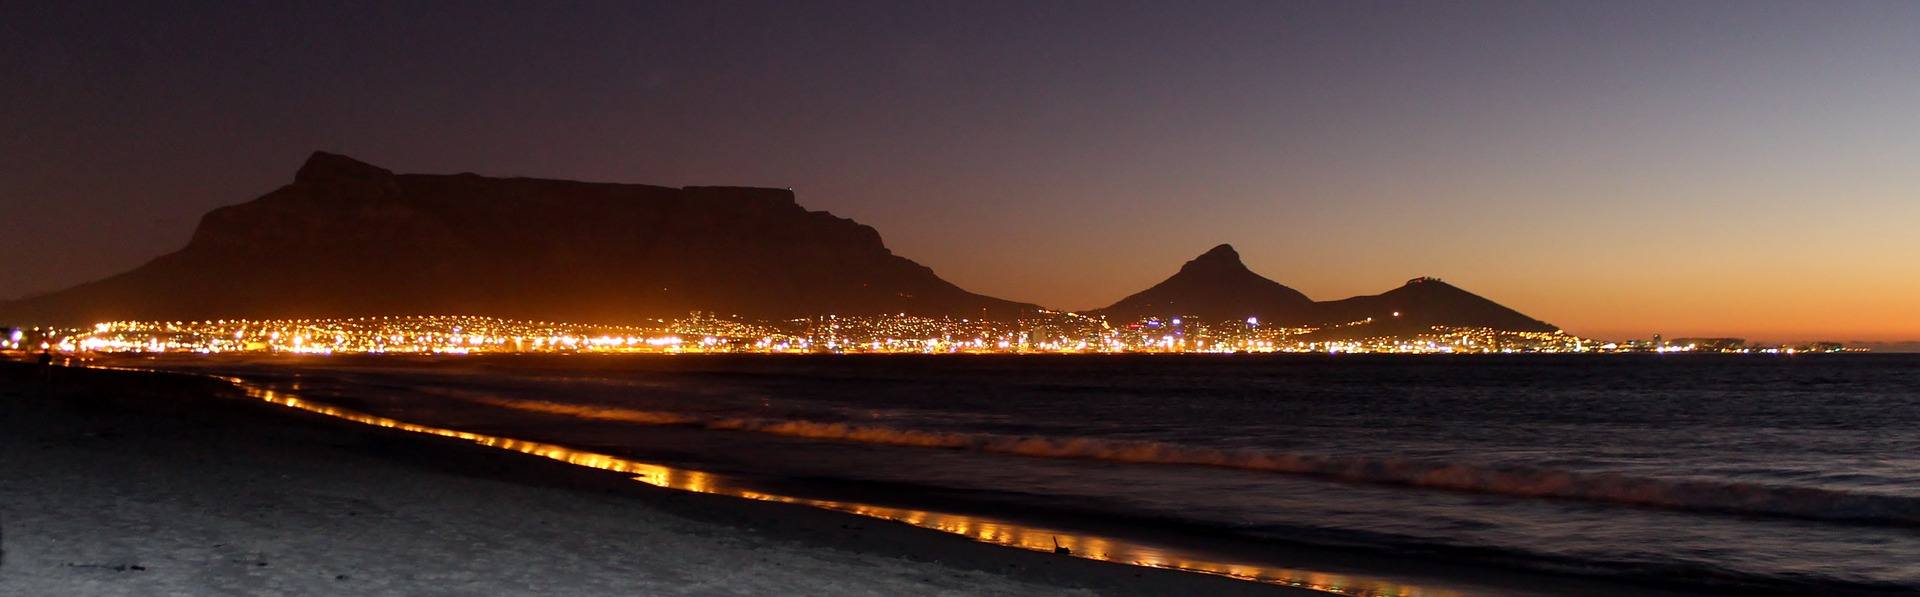 Viaggio sudafrica